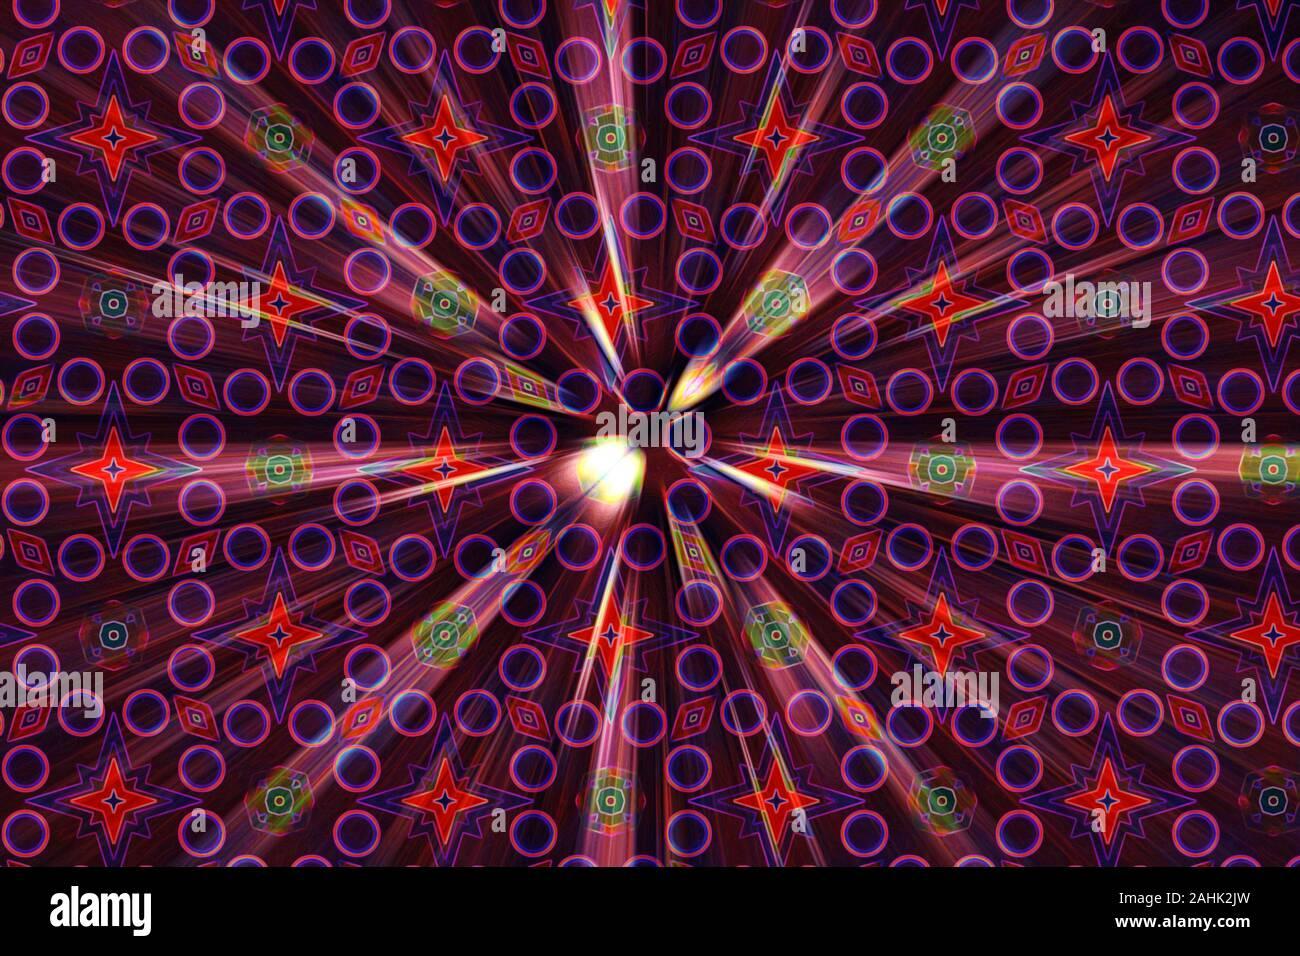 Imagen de fondo psicodélico abstracta. Foto de stock